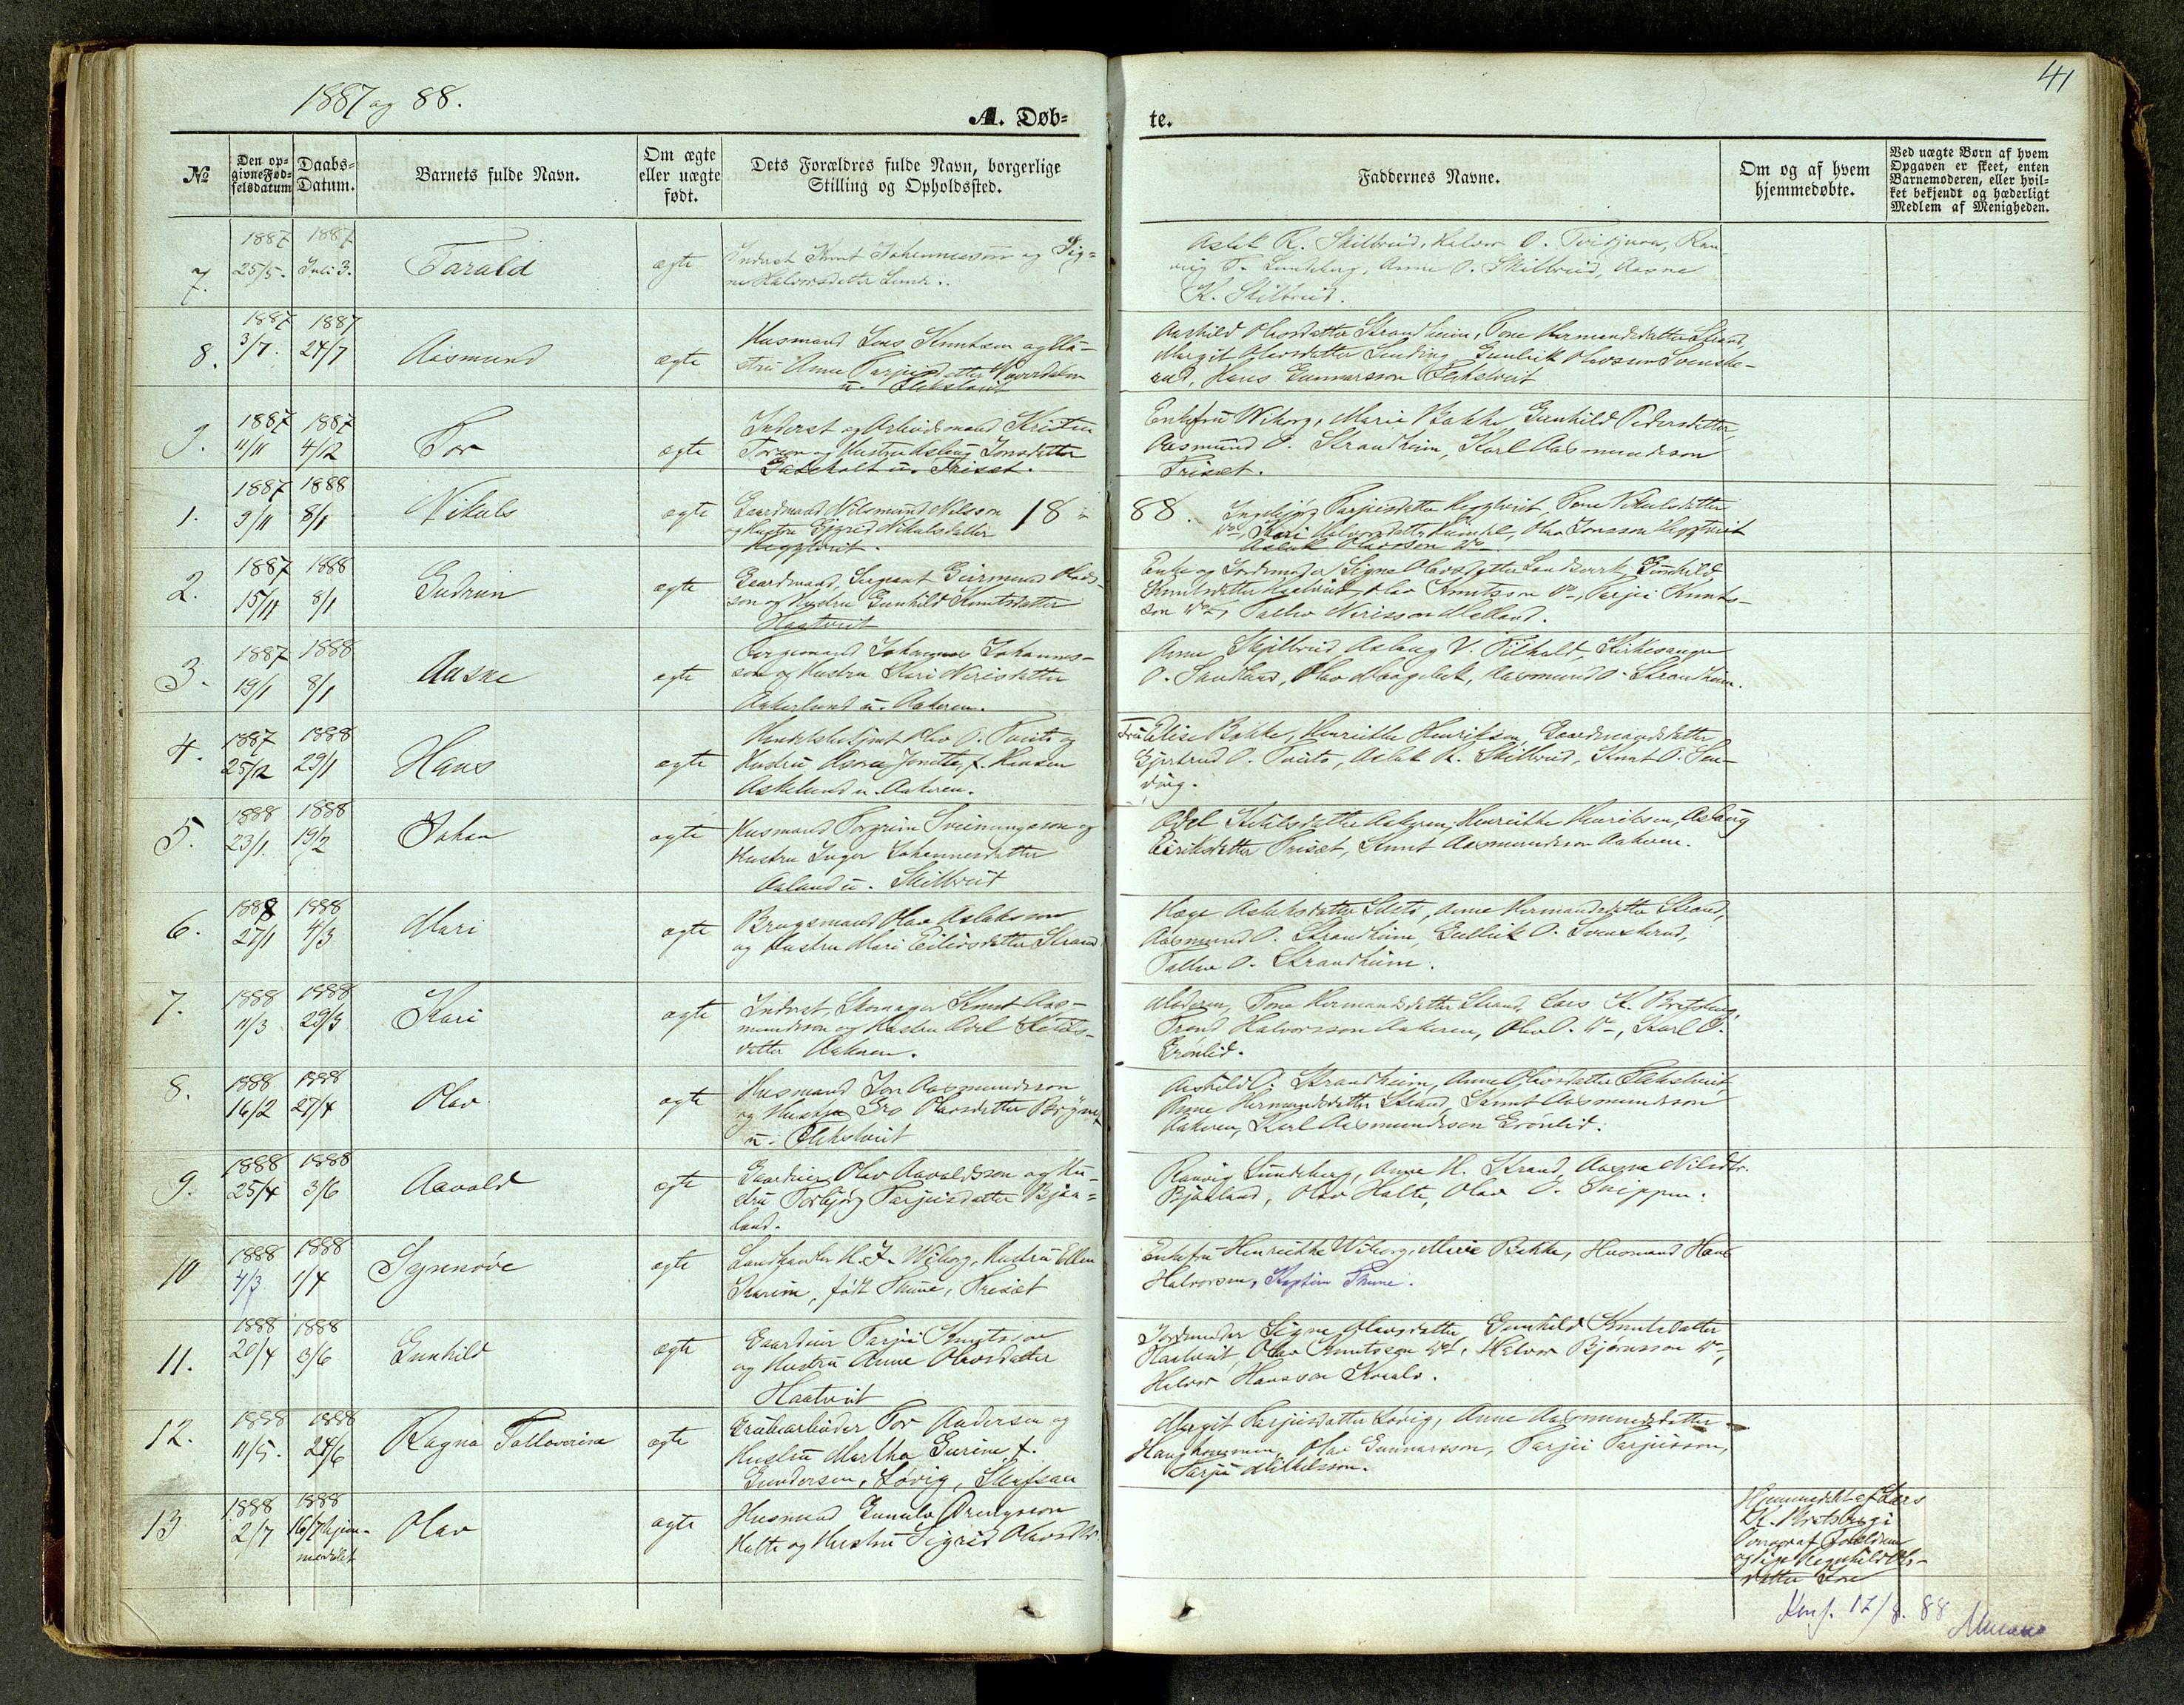 SAKO, Lårdal kirkebøker, G/Ga/L0002: Klokkerbok nr. I 2, 1861-1890, s. 41